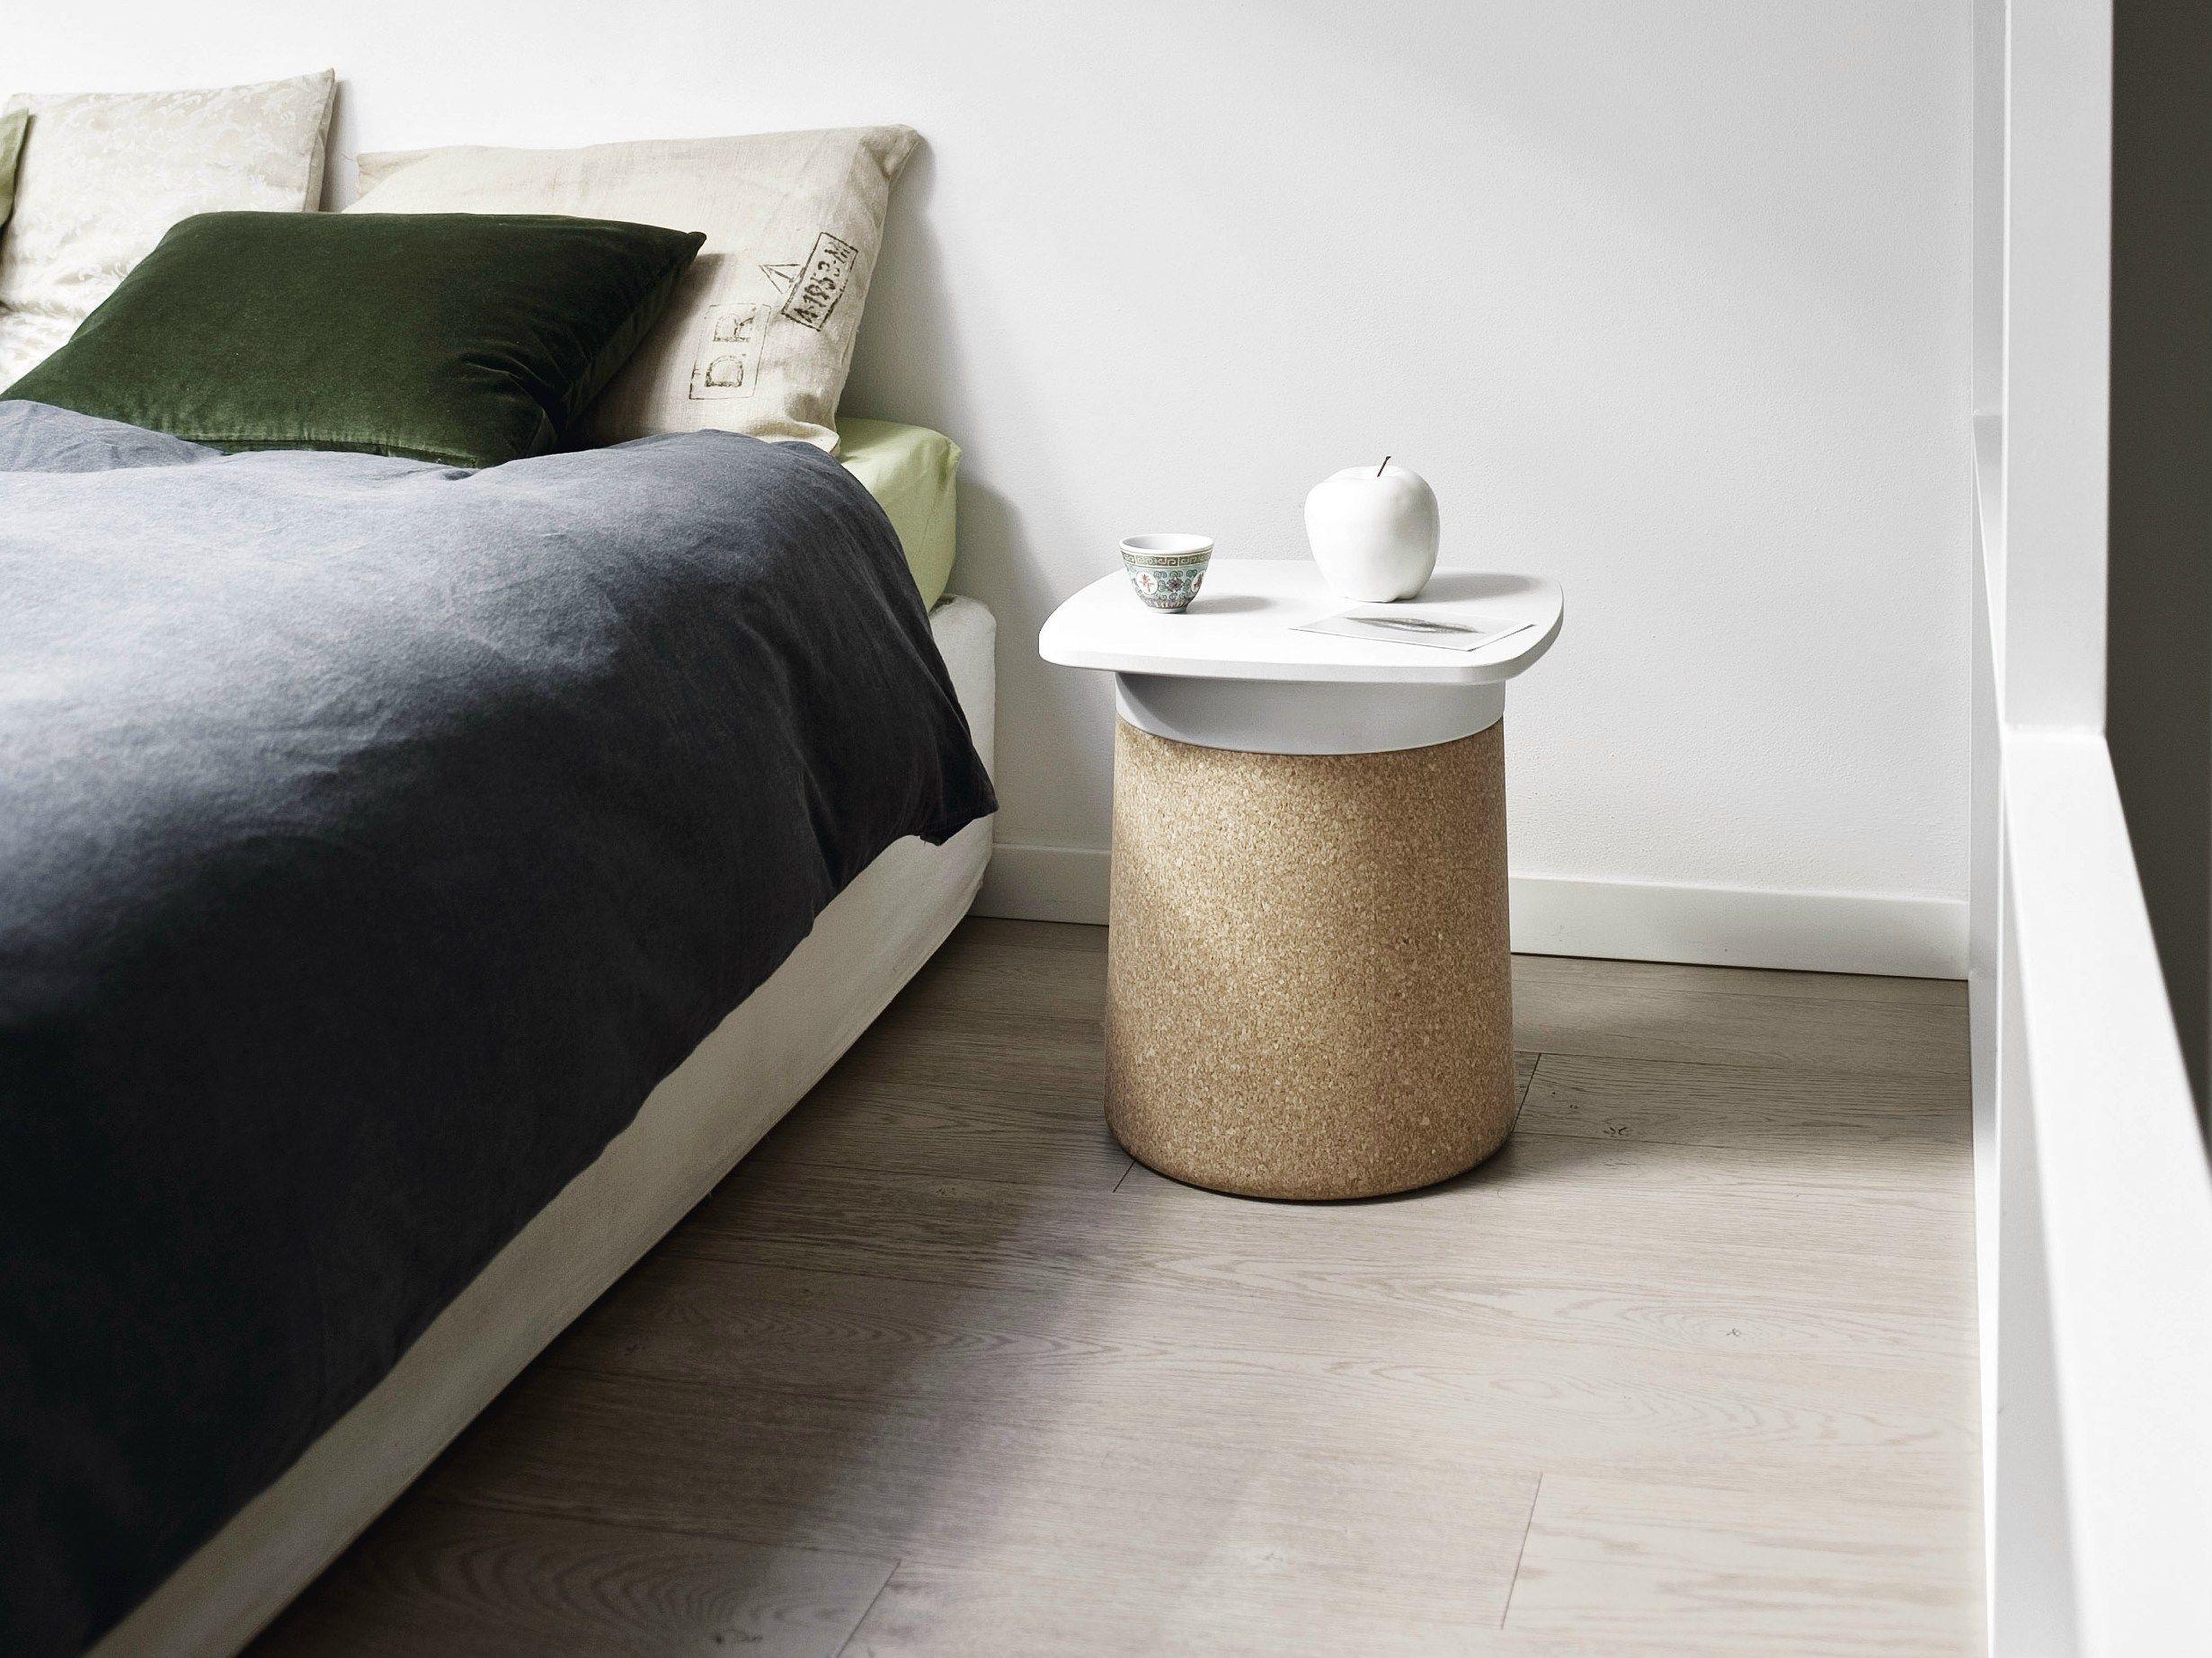 degree cork coffee table by kristalia design patrick norguet - Cork Cafe Decor